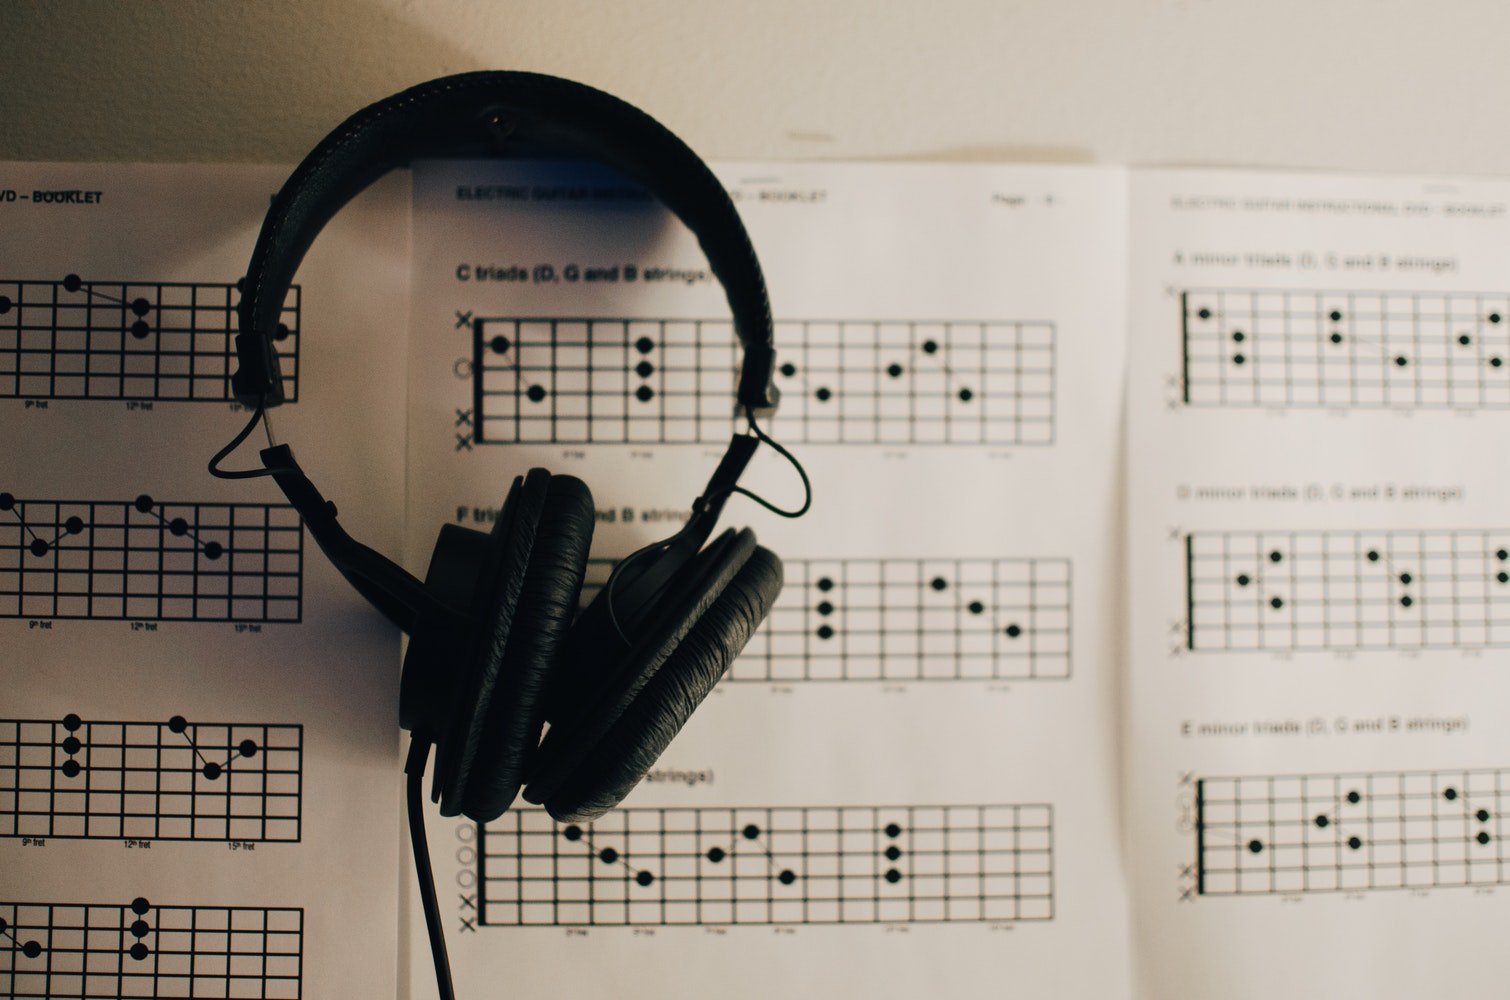 guitar tab chord charts